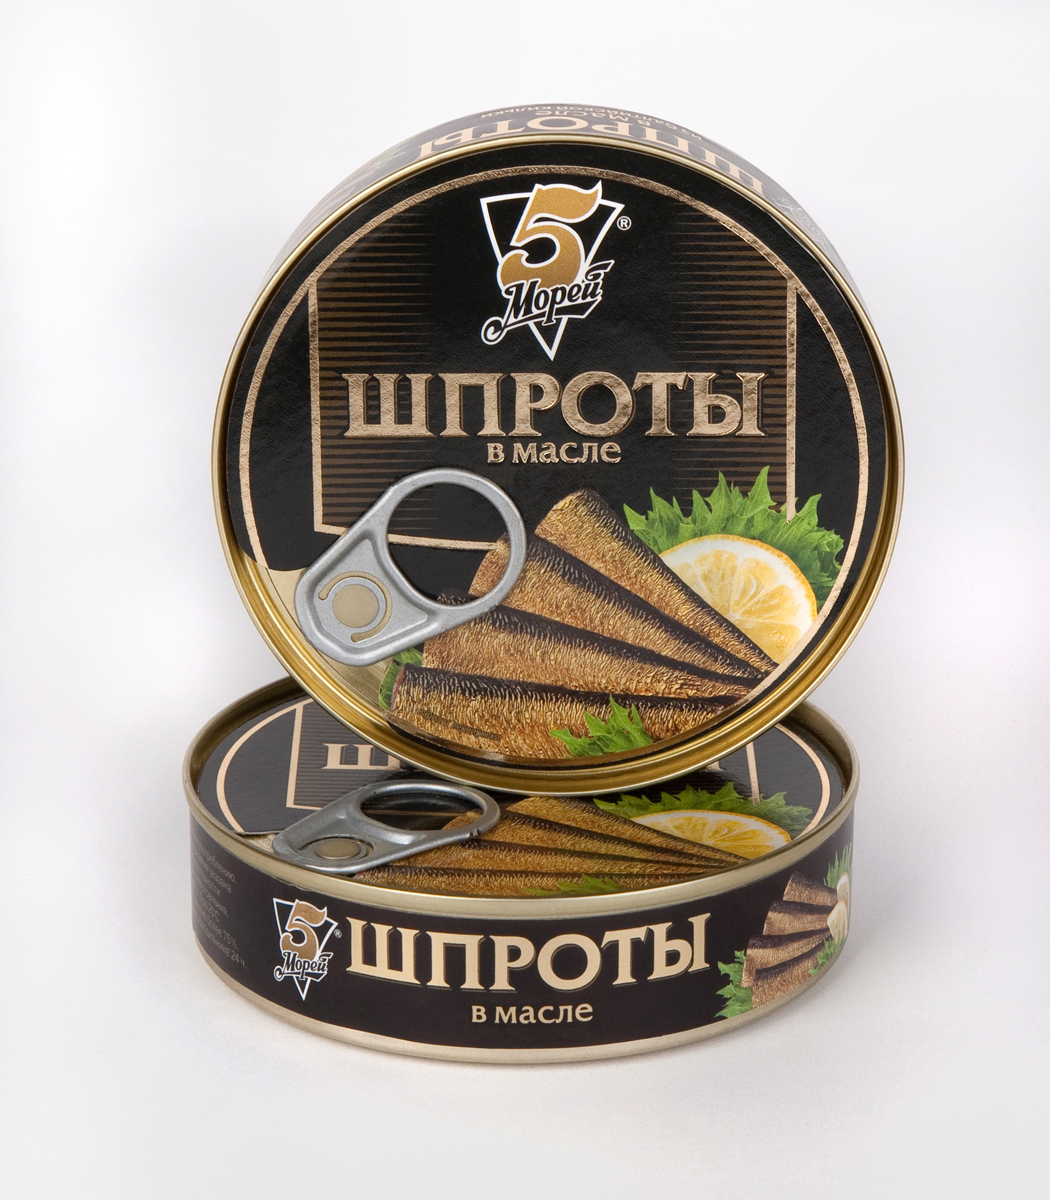 5 Морей Шпроты в масле, 160 г loacker vanille вафли 225 г